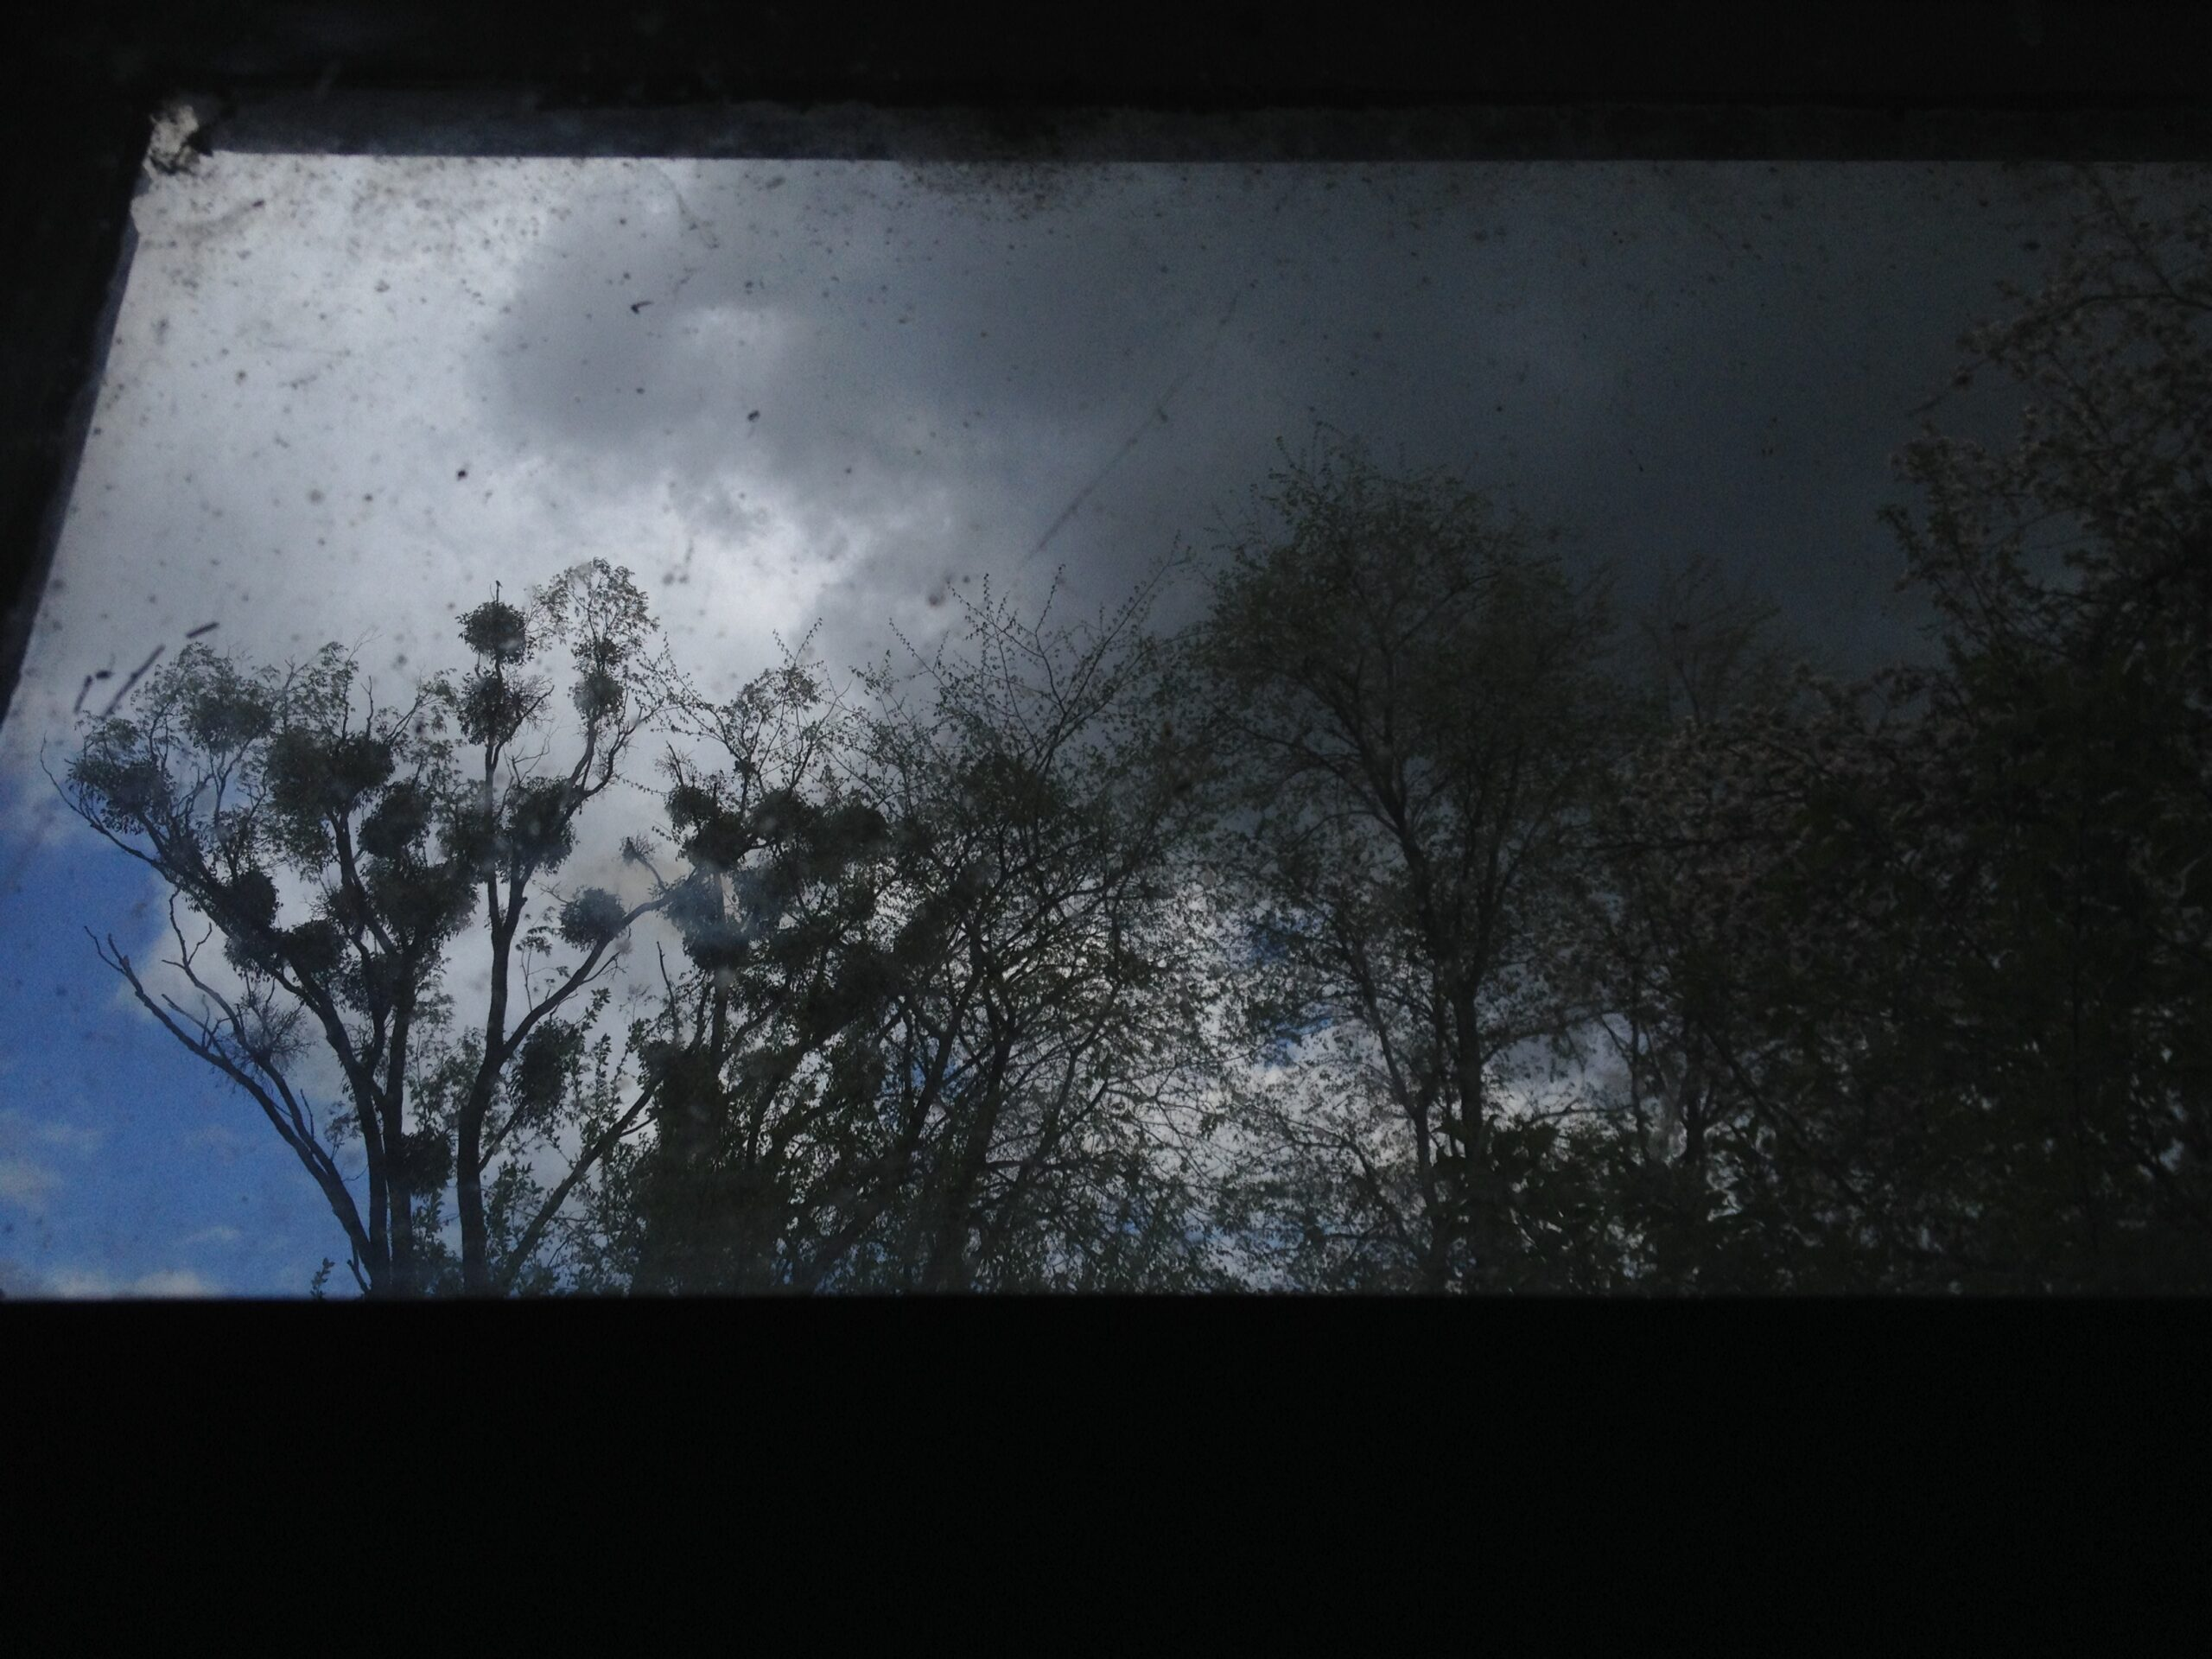 Влада Ралко, види з вікна, 2014